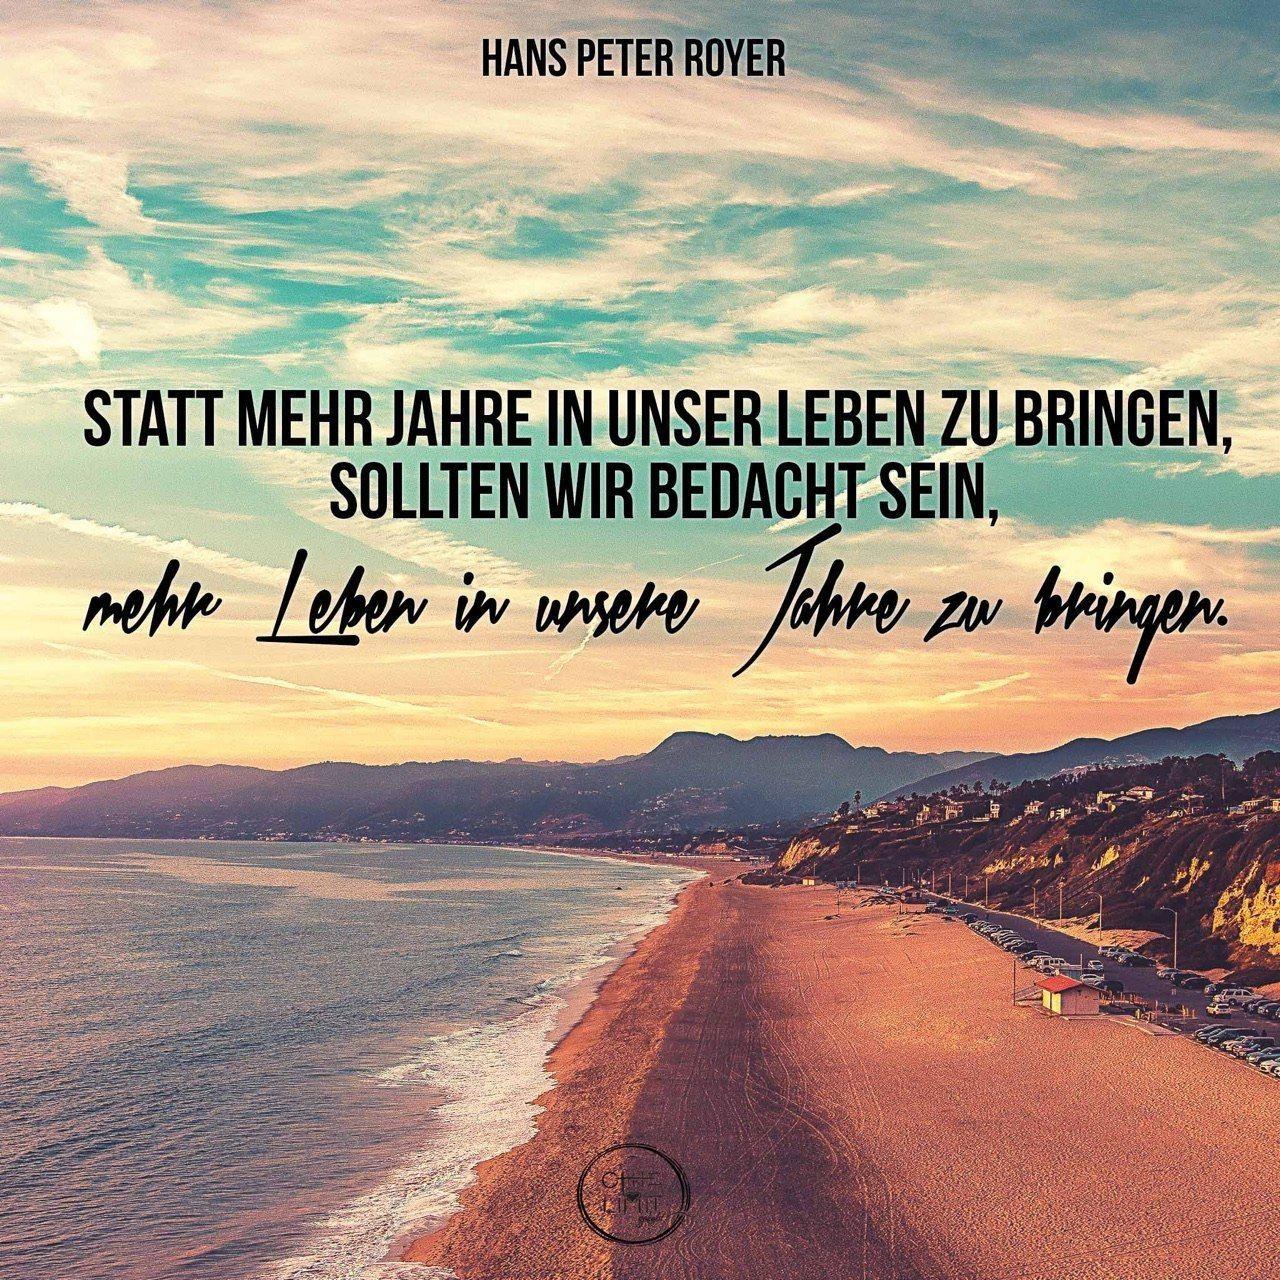 #impuls#leben#jahre#zitat#hanspeterroyer | German | Bible ...